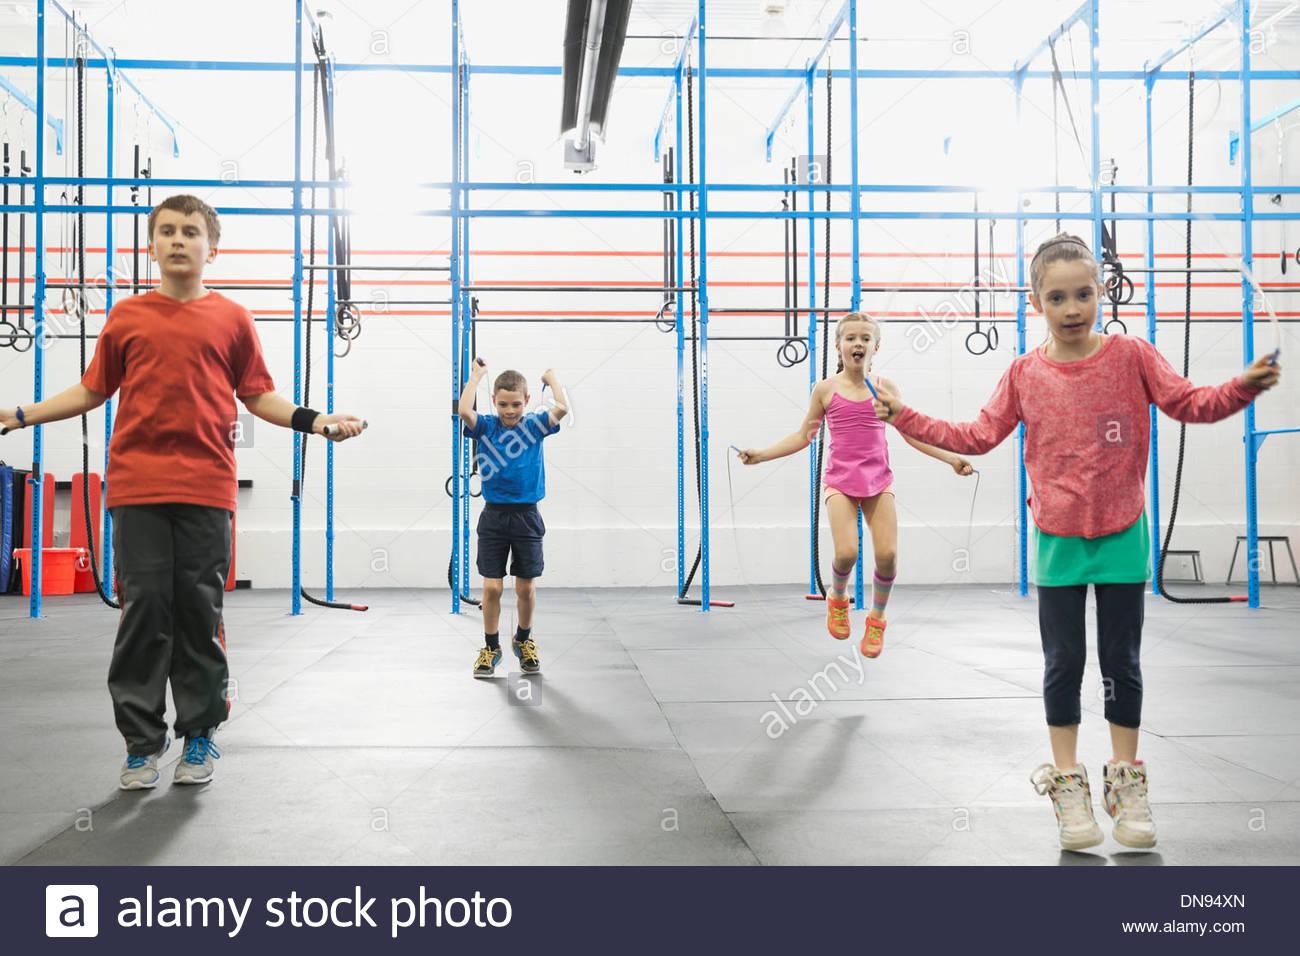 Children skipping in gym - Stock Image